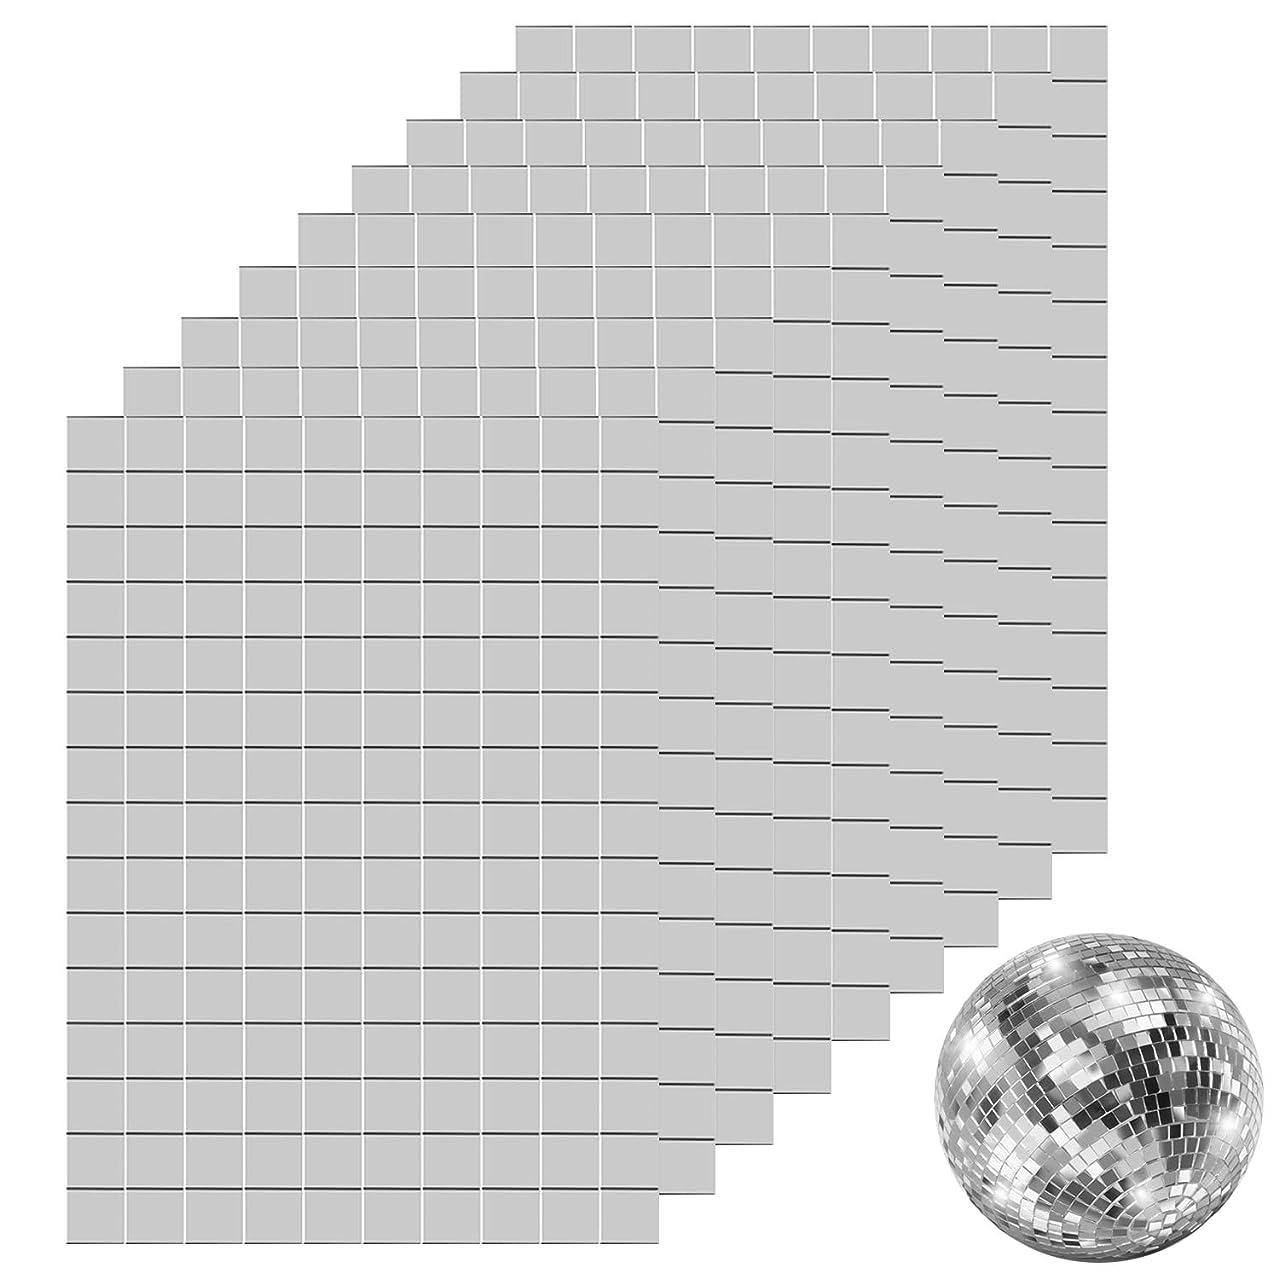 Ruisita 450 Pieces Self-Adhesive Mini Square Glass Mirrors Mosaic Tiles Mirror Mosaic Stickers for DIY Craft Decoration, 1 x 1 cm